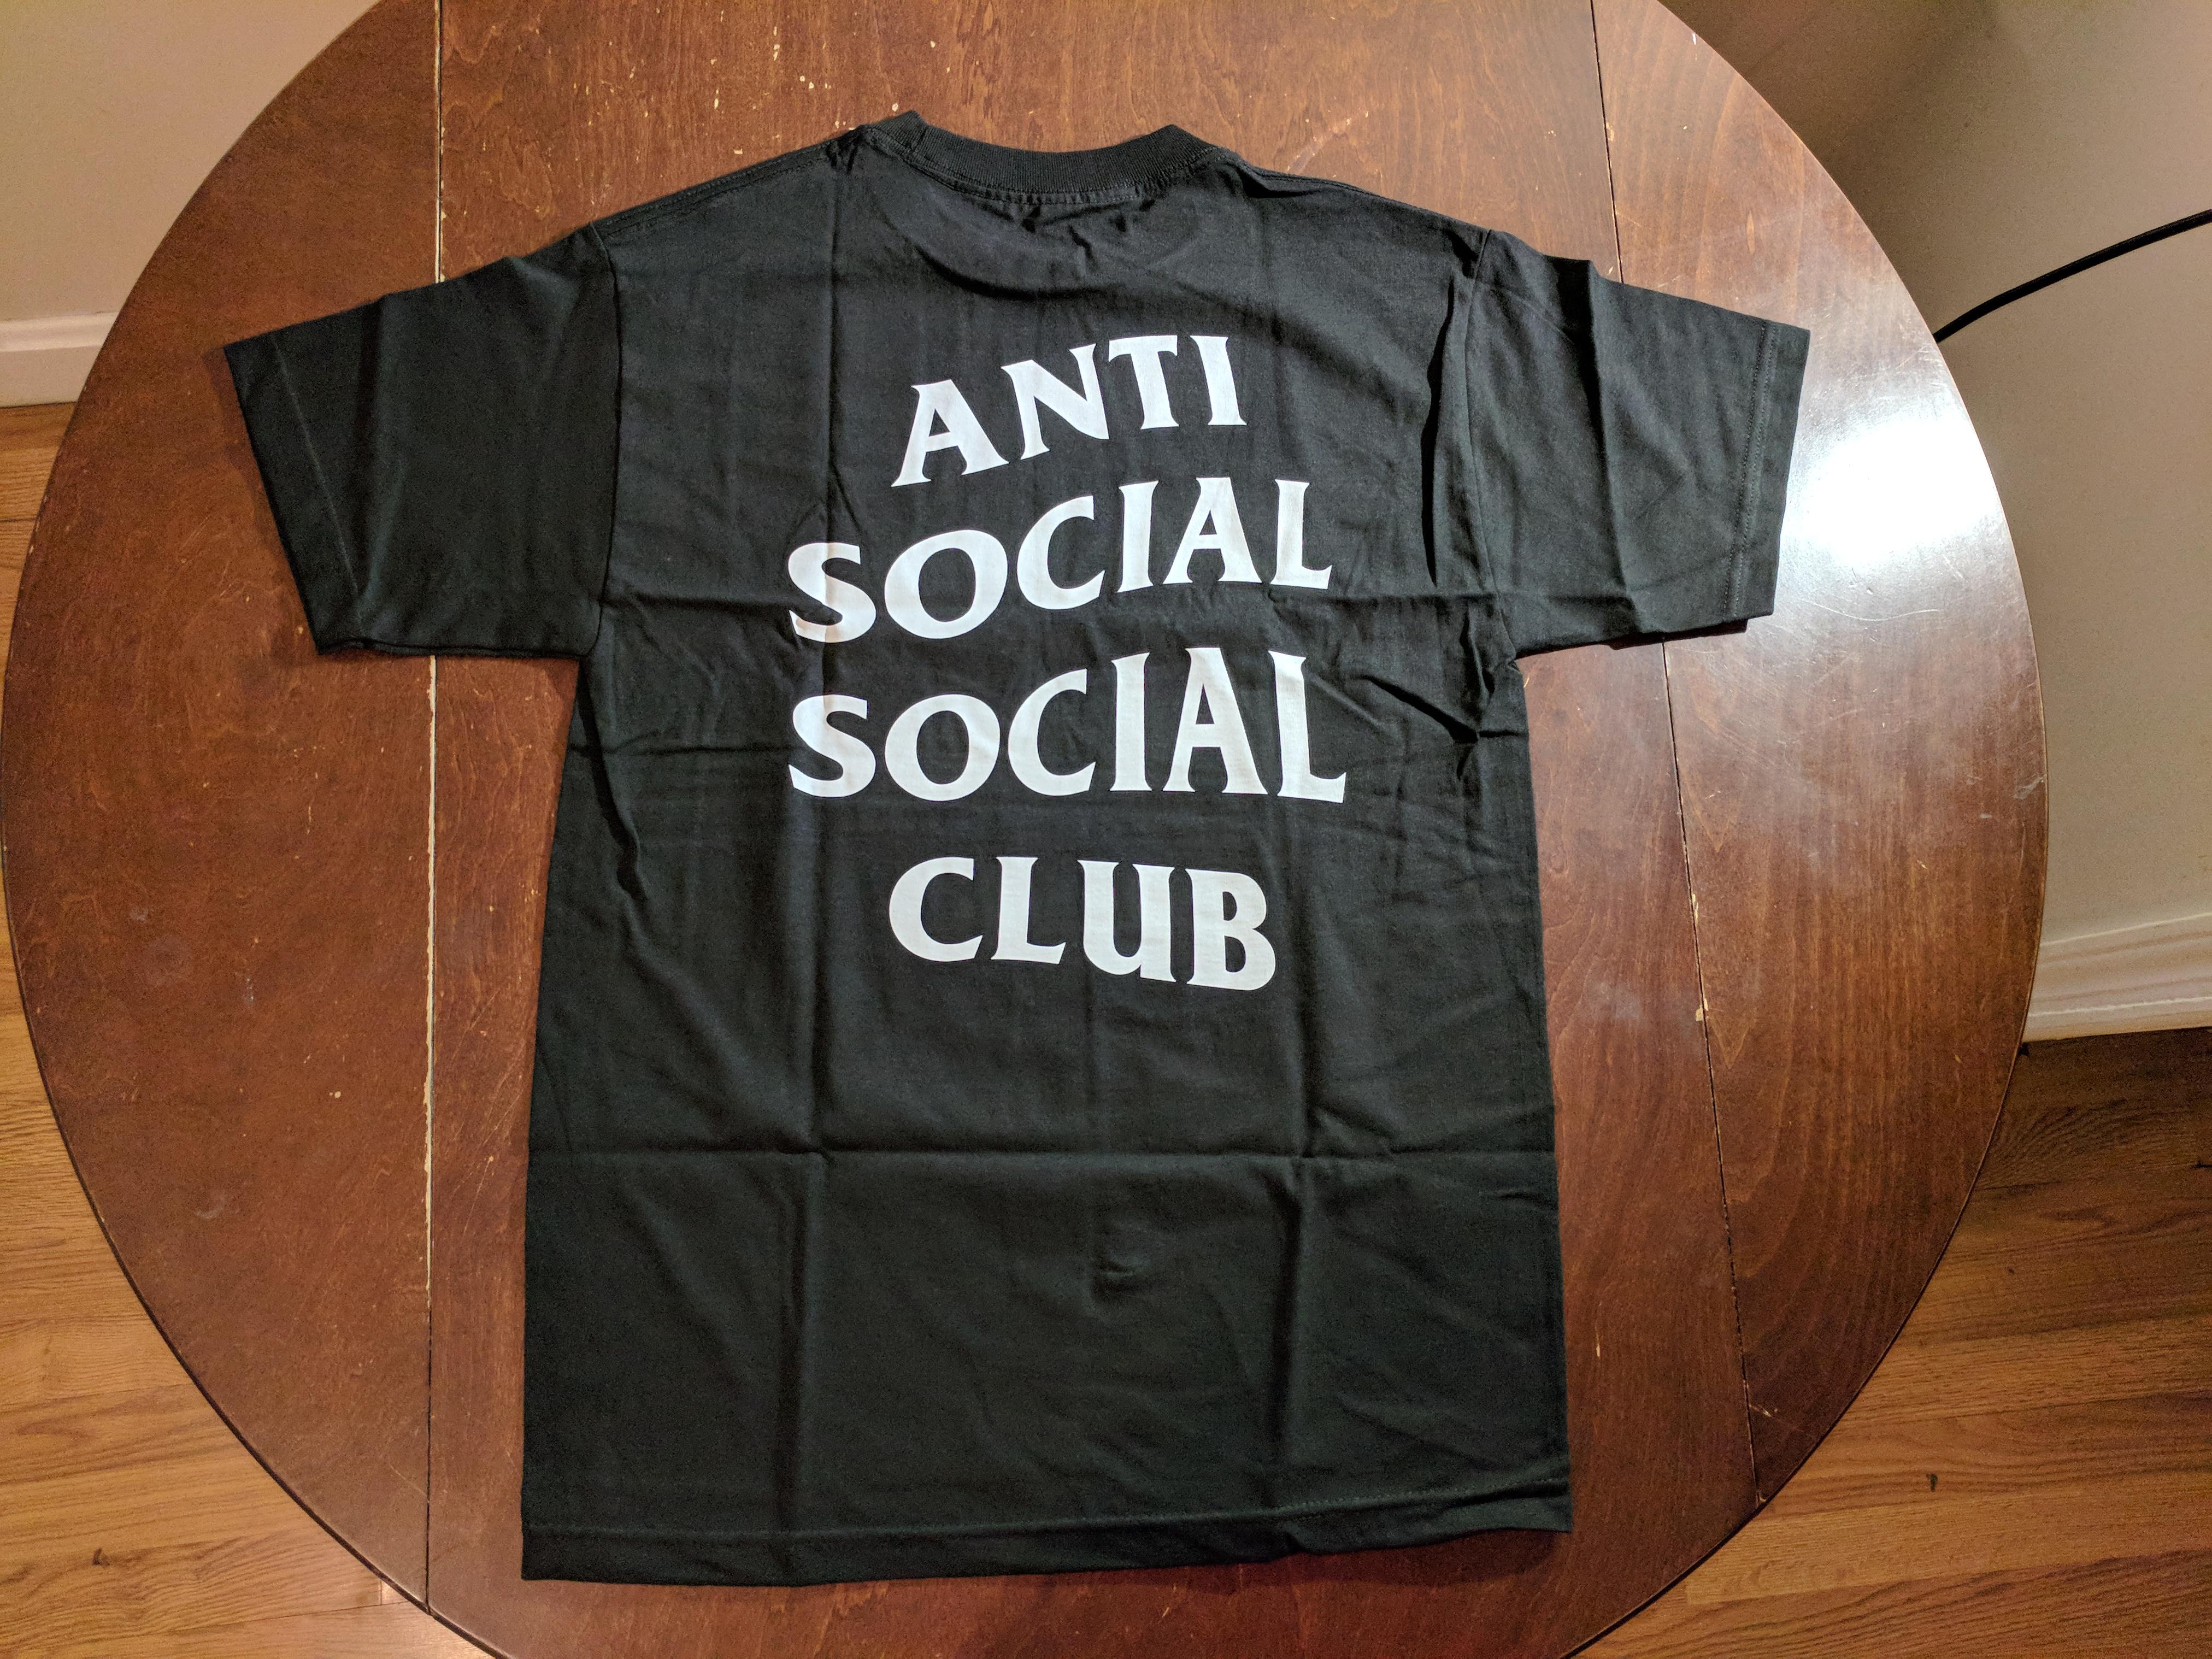 aab6304ed9e9 Antisocial Social Club. ASSC Logo black tee 2 Anti Social Social Club Bape  Supreme Nike